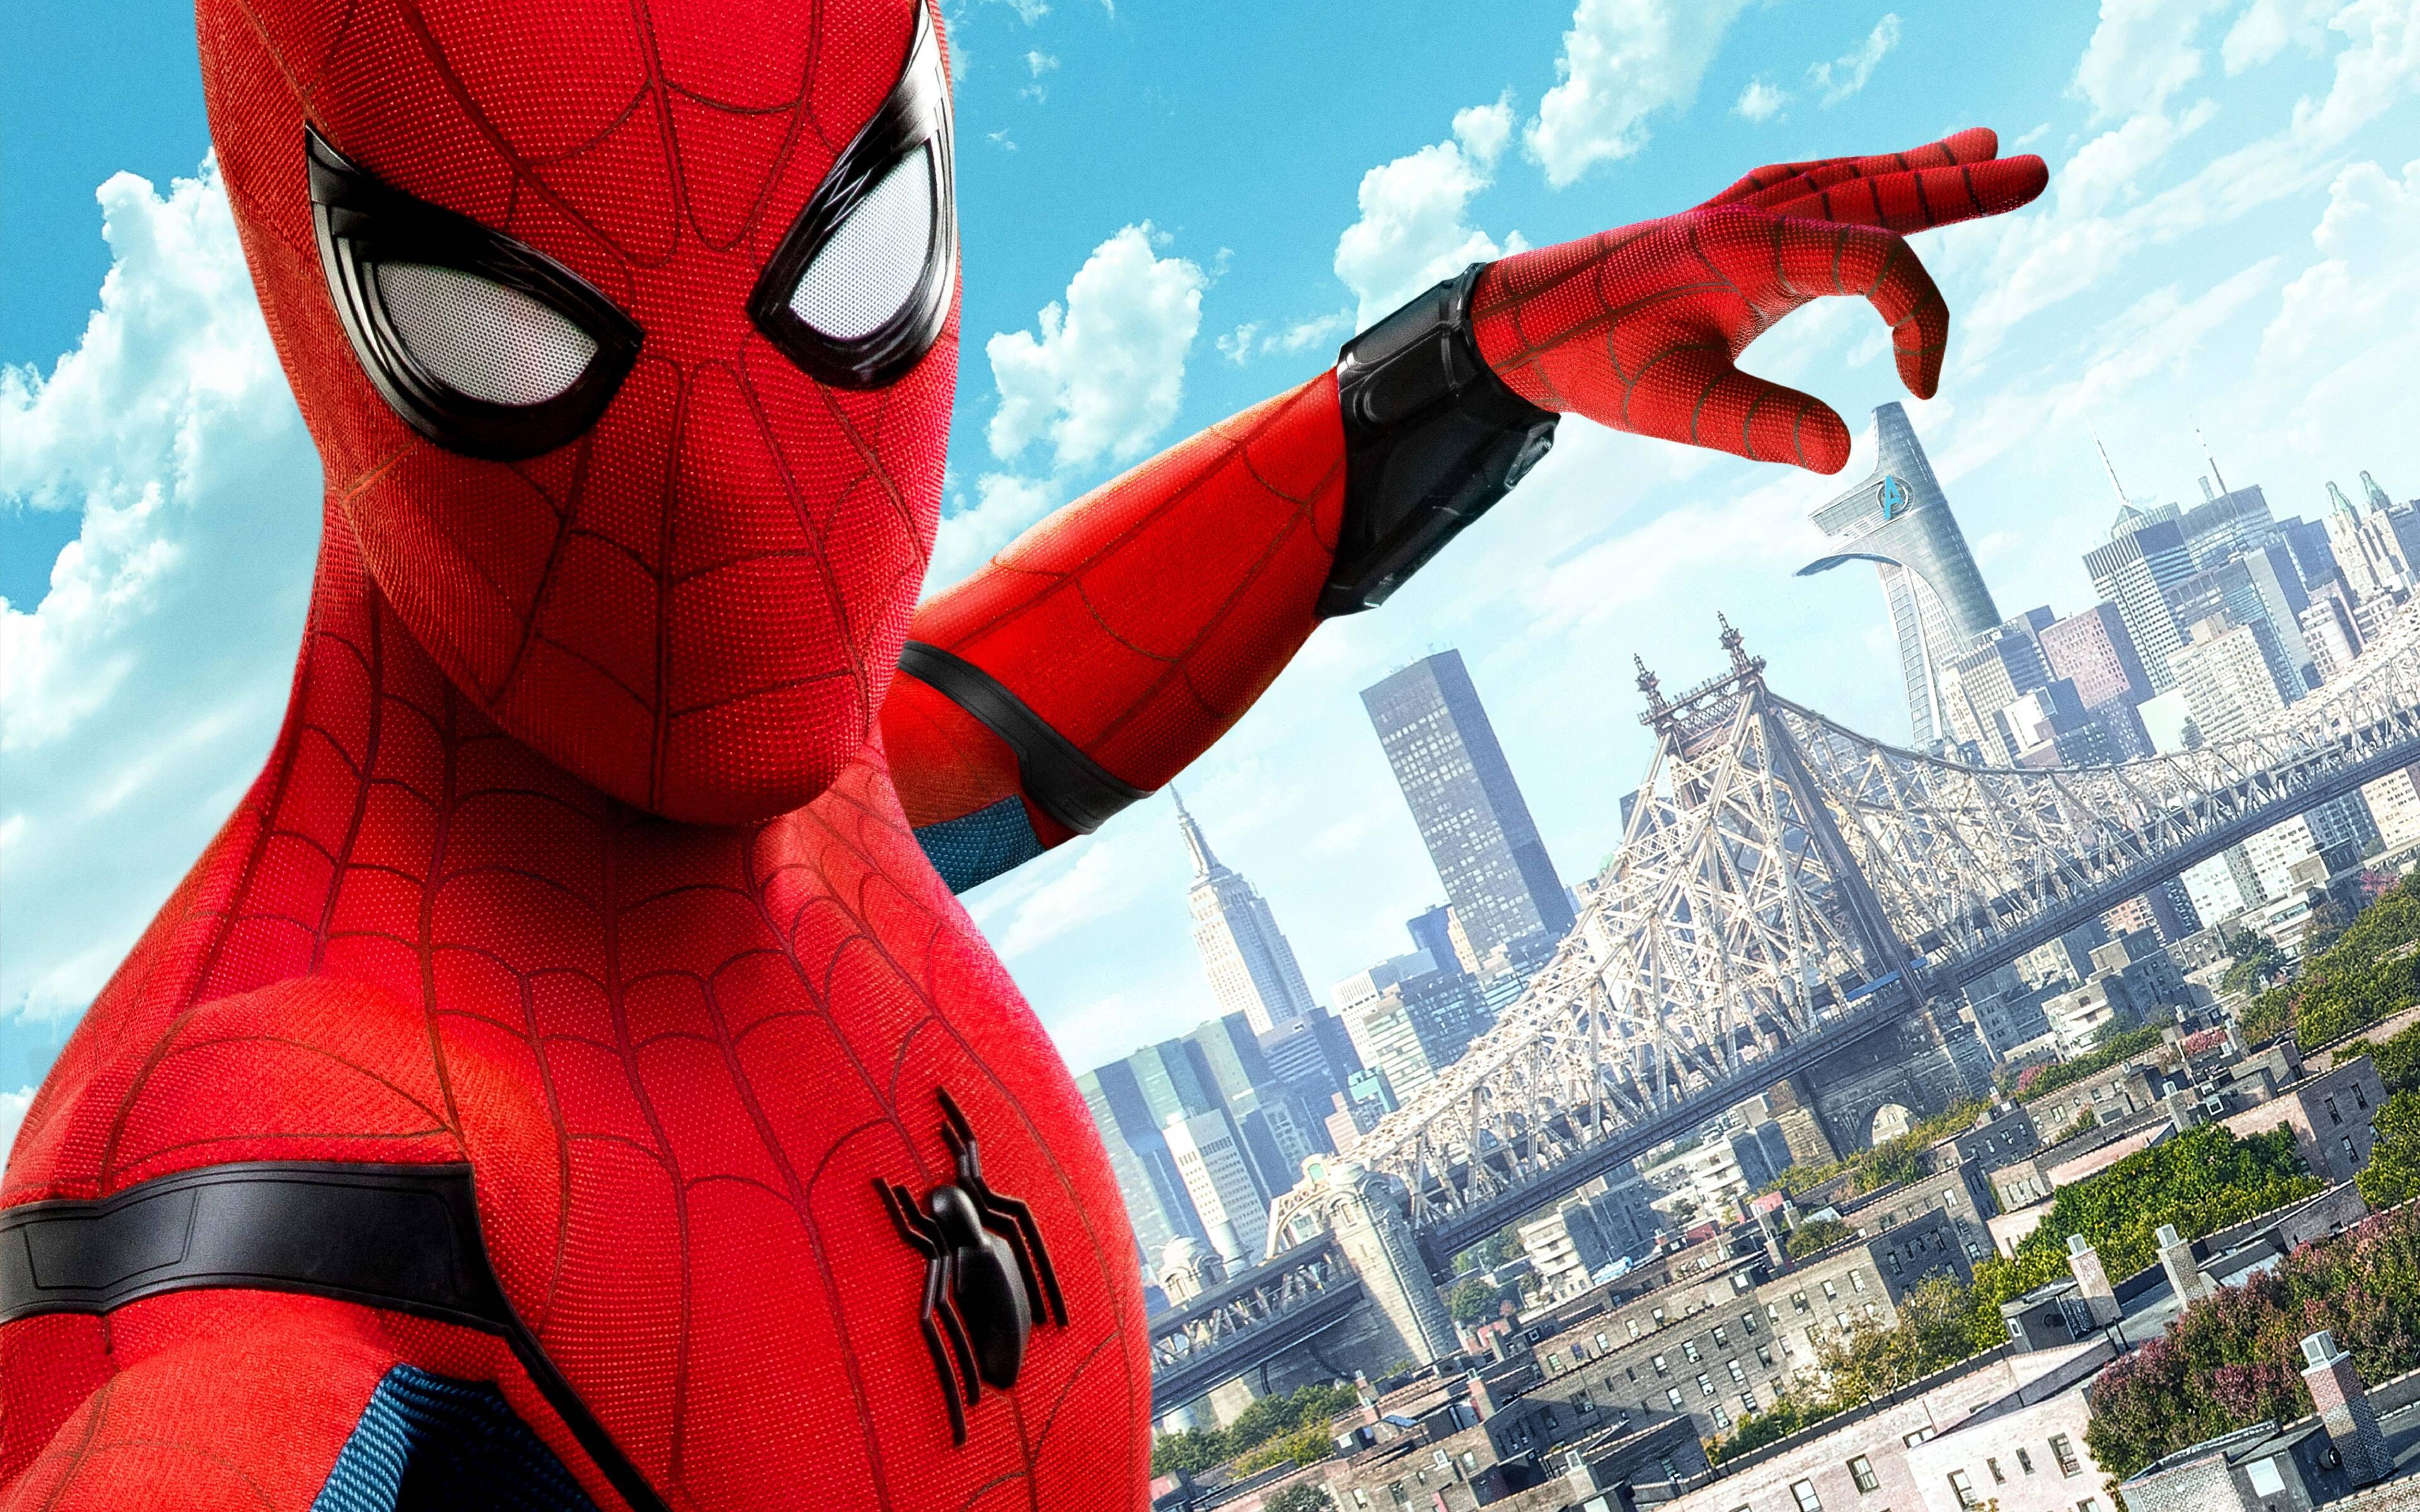 spiderman-homecoming-2017-8k-vl.jpg